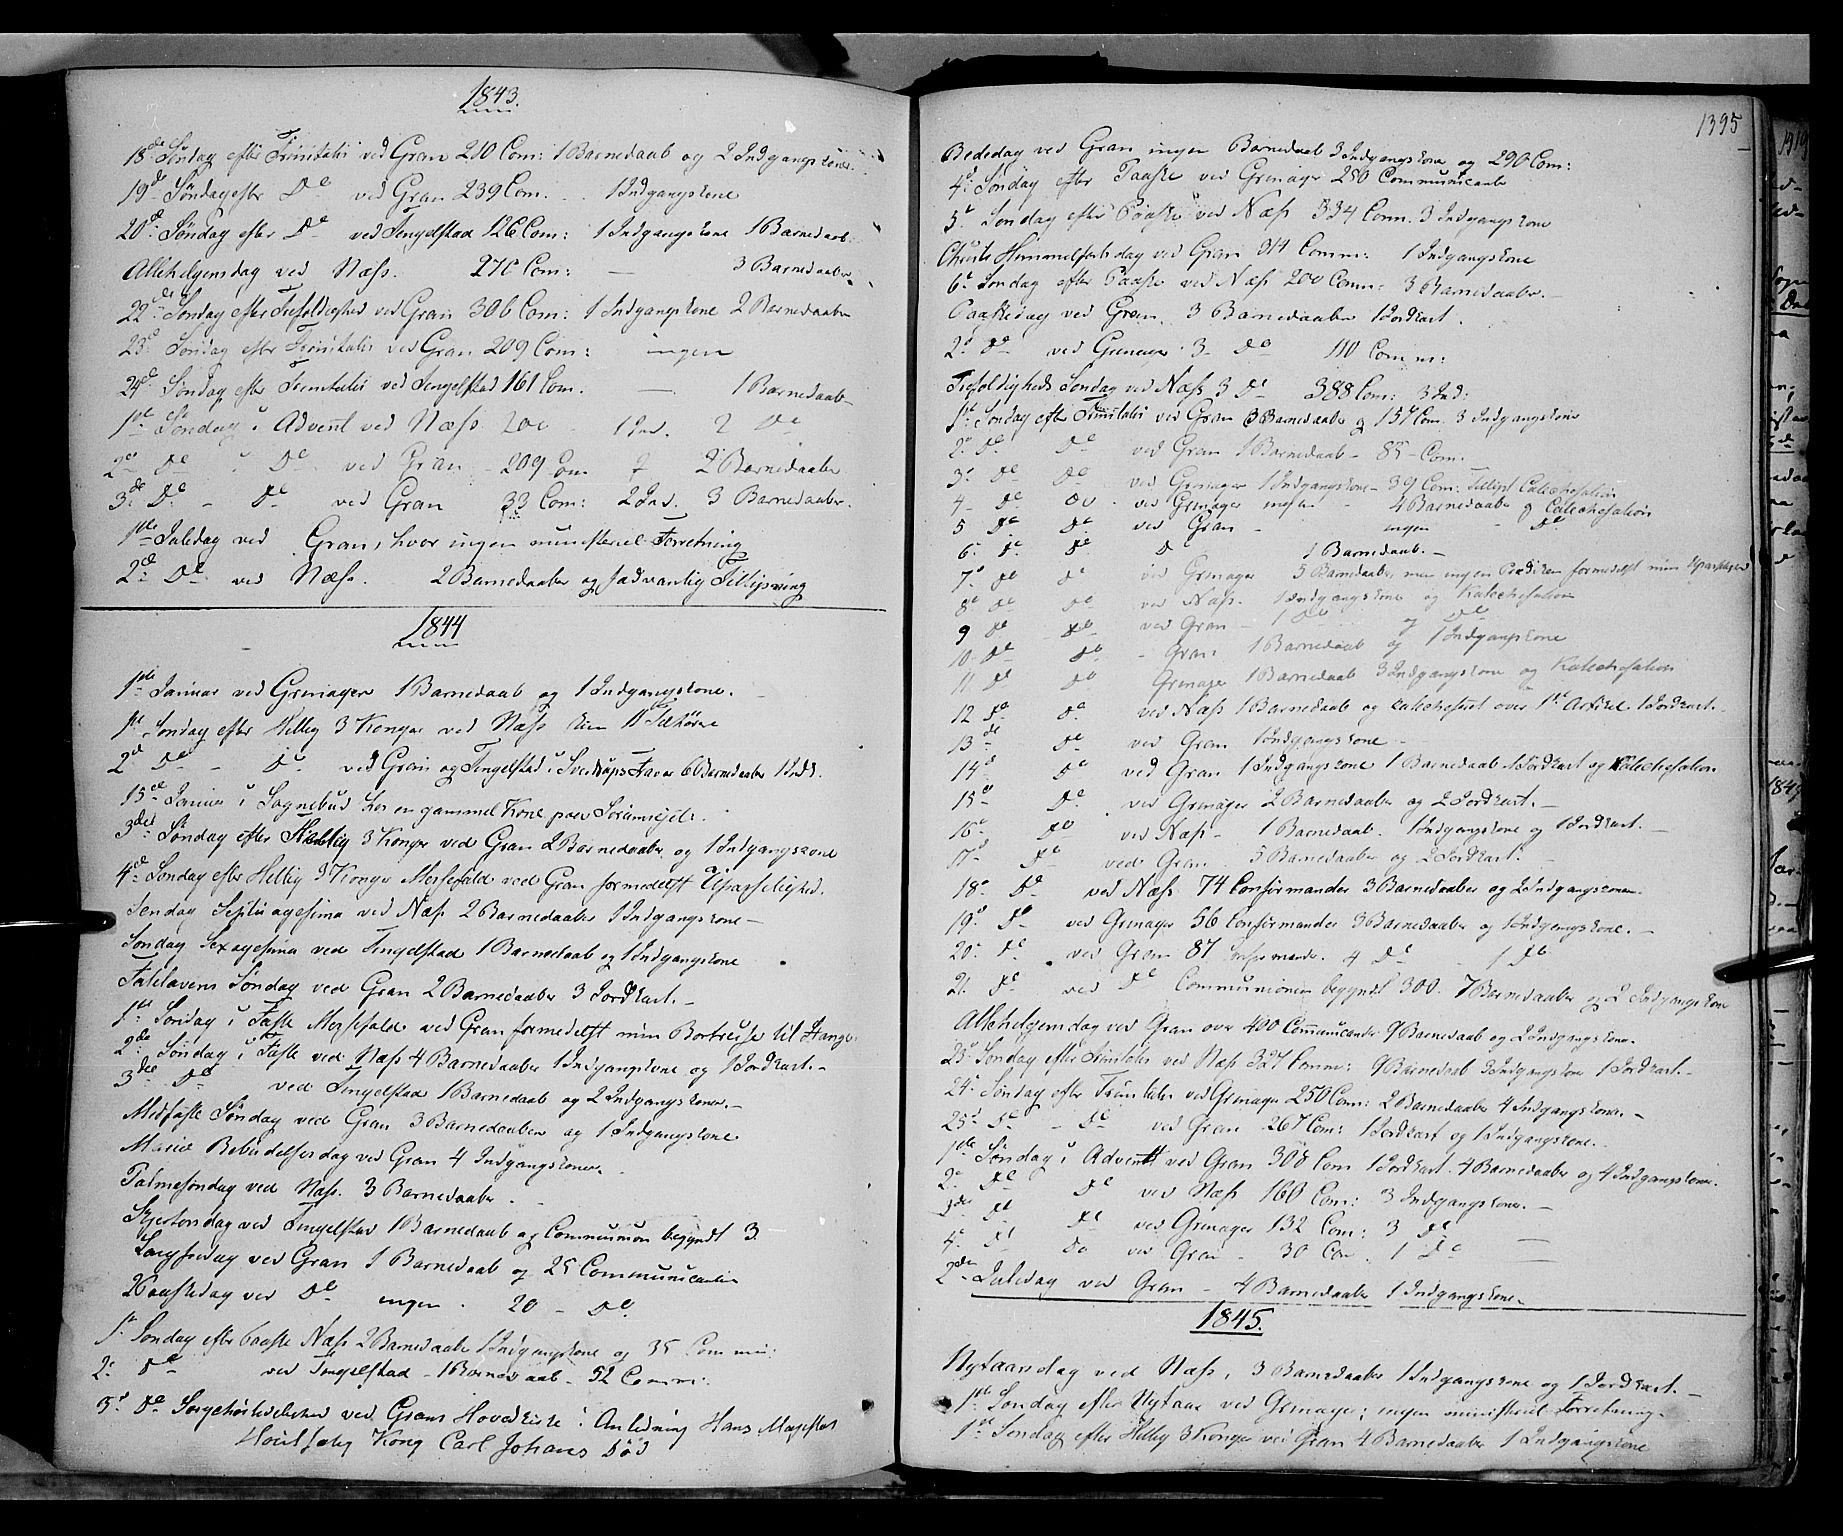 SAH, Gran prestekontor, Ministerialbok nr. 11, 1842-1856, s. 1394-1395